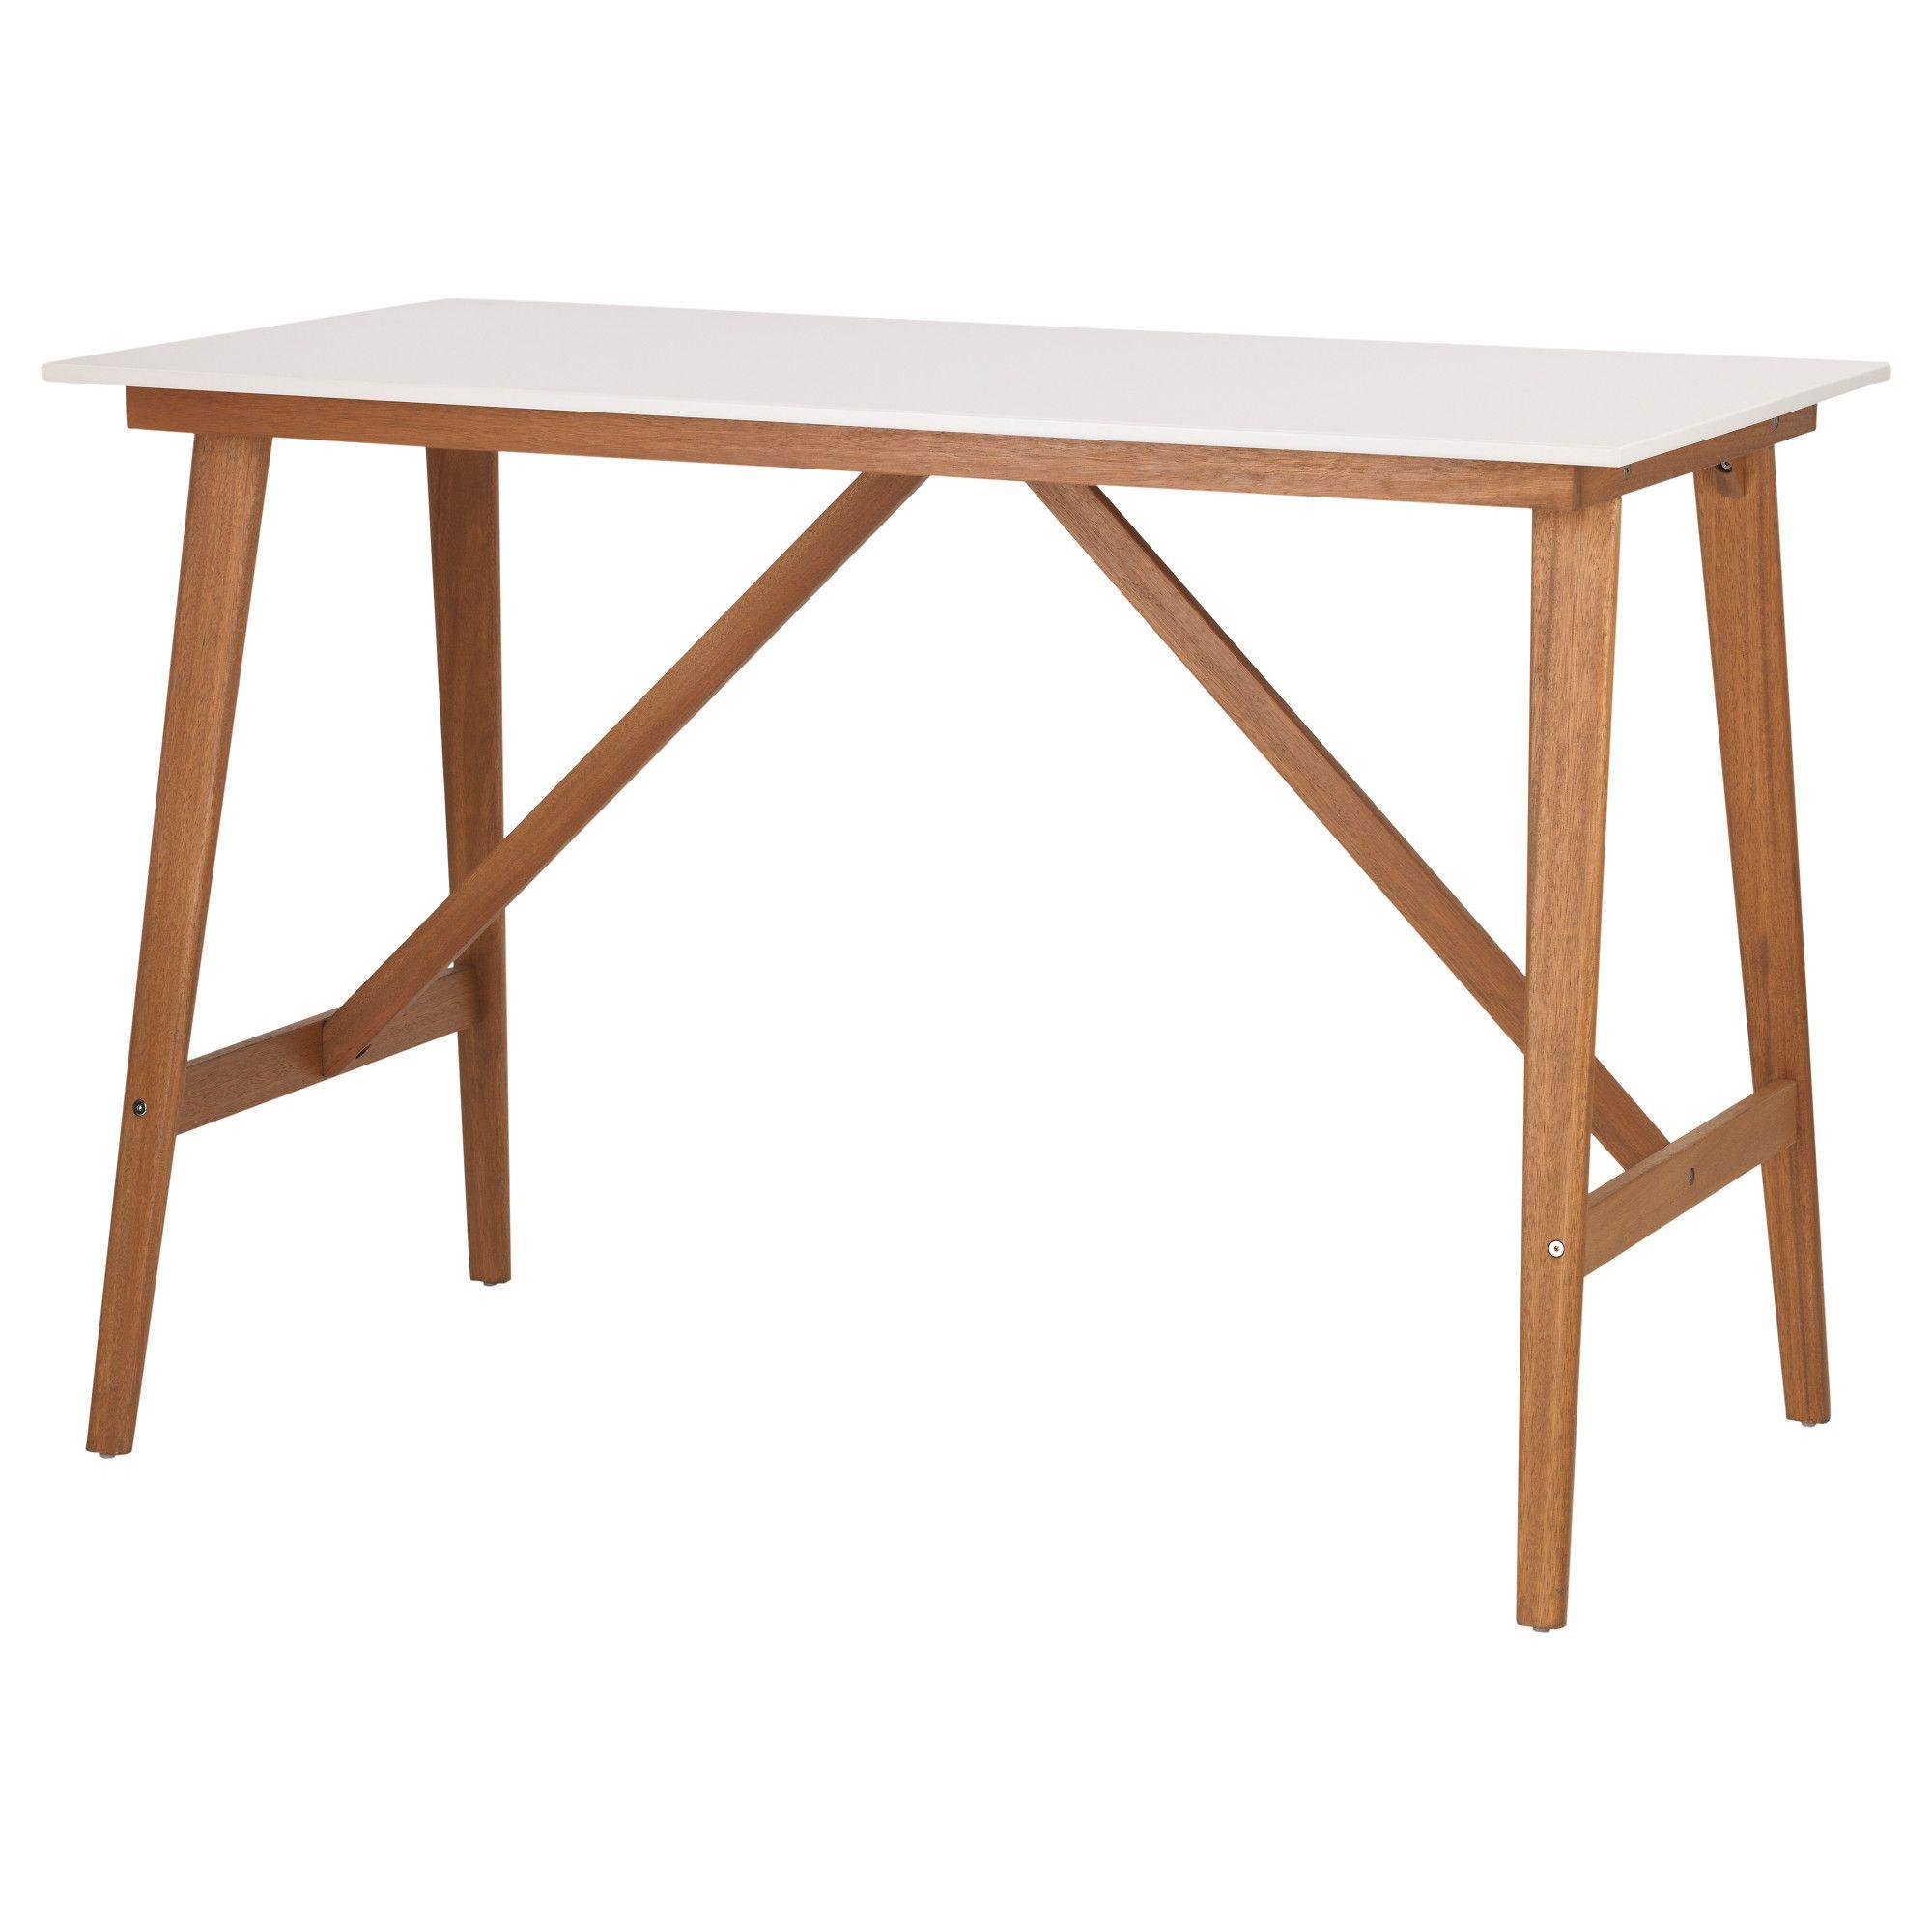 Table Pliante Ikea Norden Affordable Fabulous Trendy Cheap ... pour Ikea Table Pliante Jardin